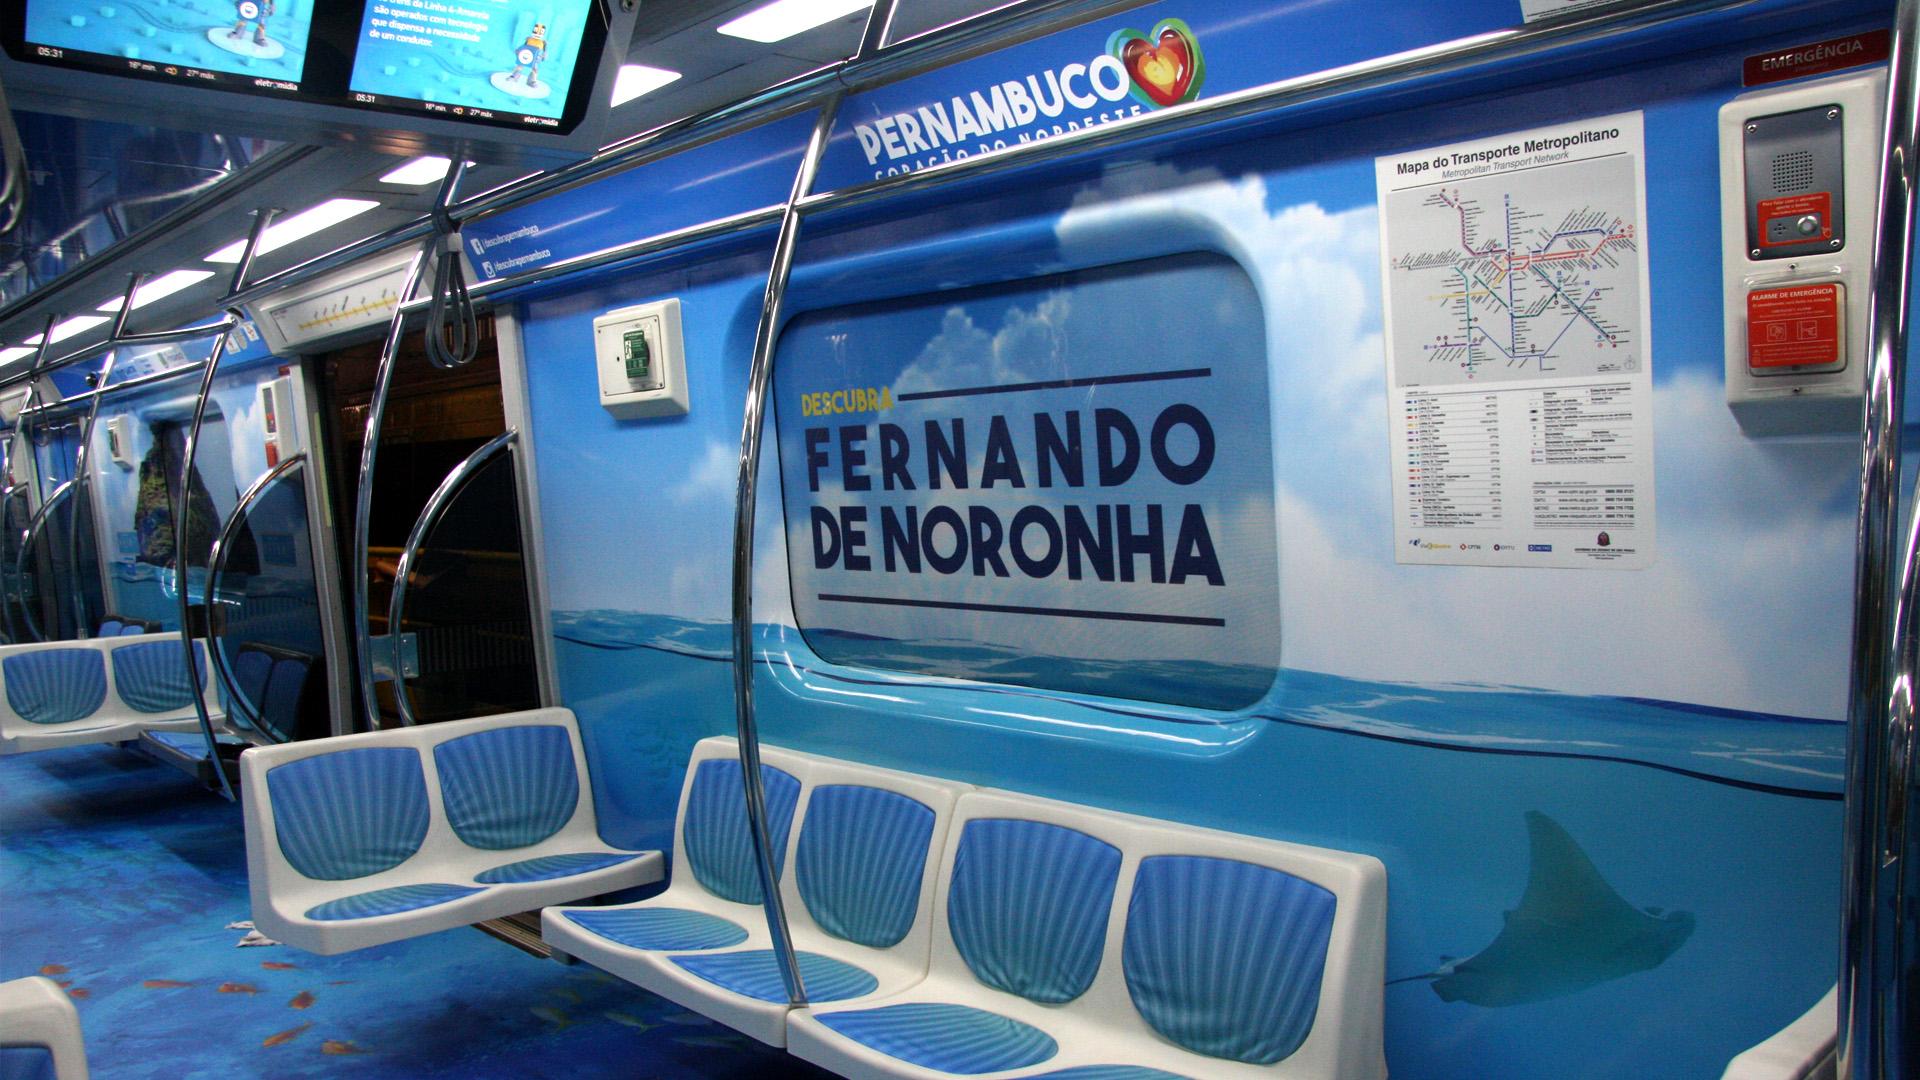 ON_Site_Pernambuco2